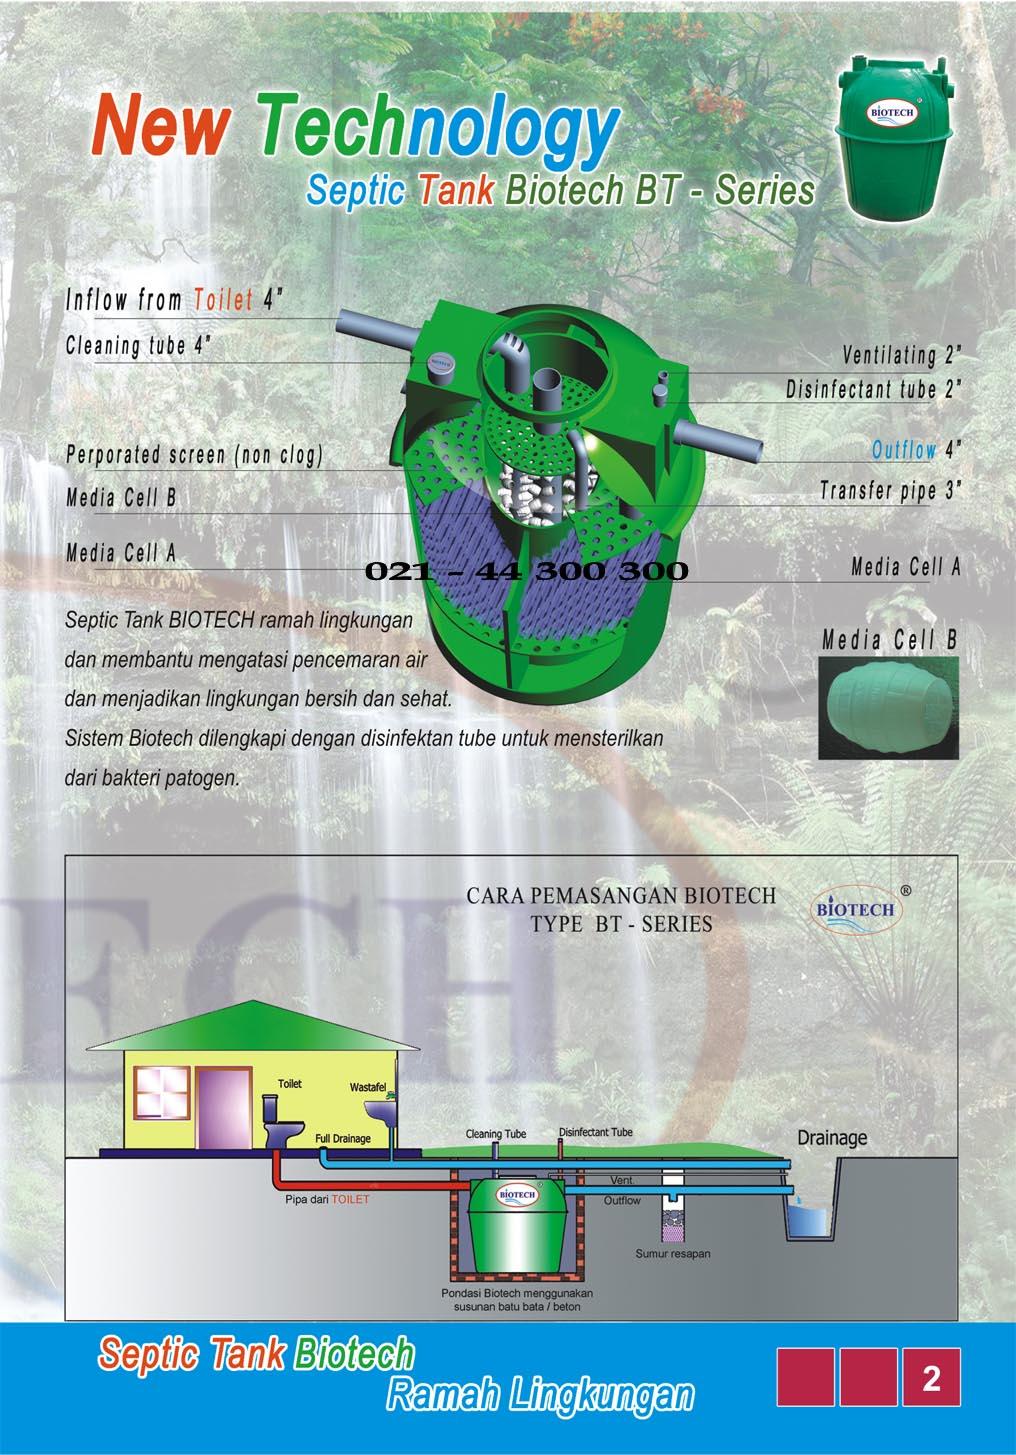 septic tank biotech, cara pasang biotech septic tank